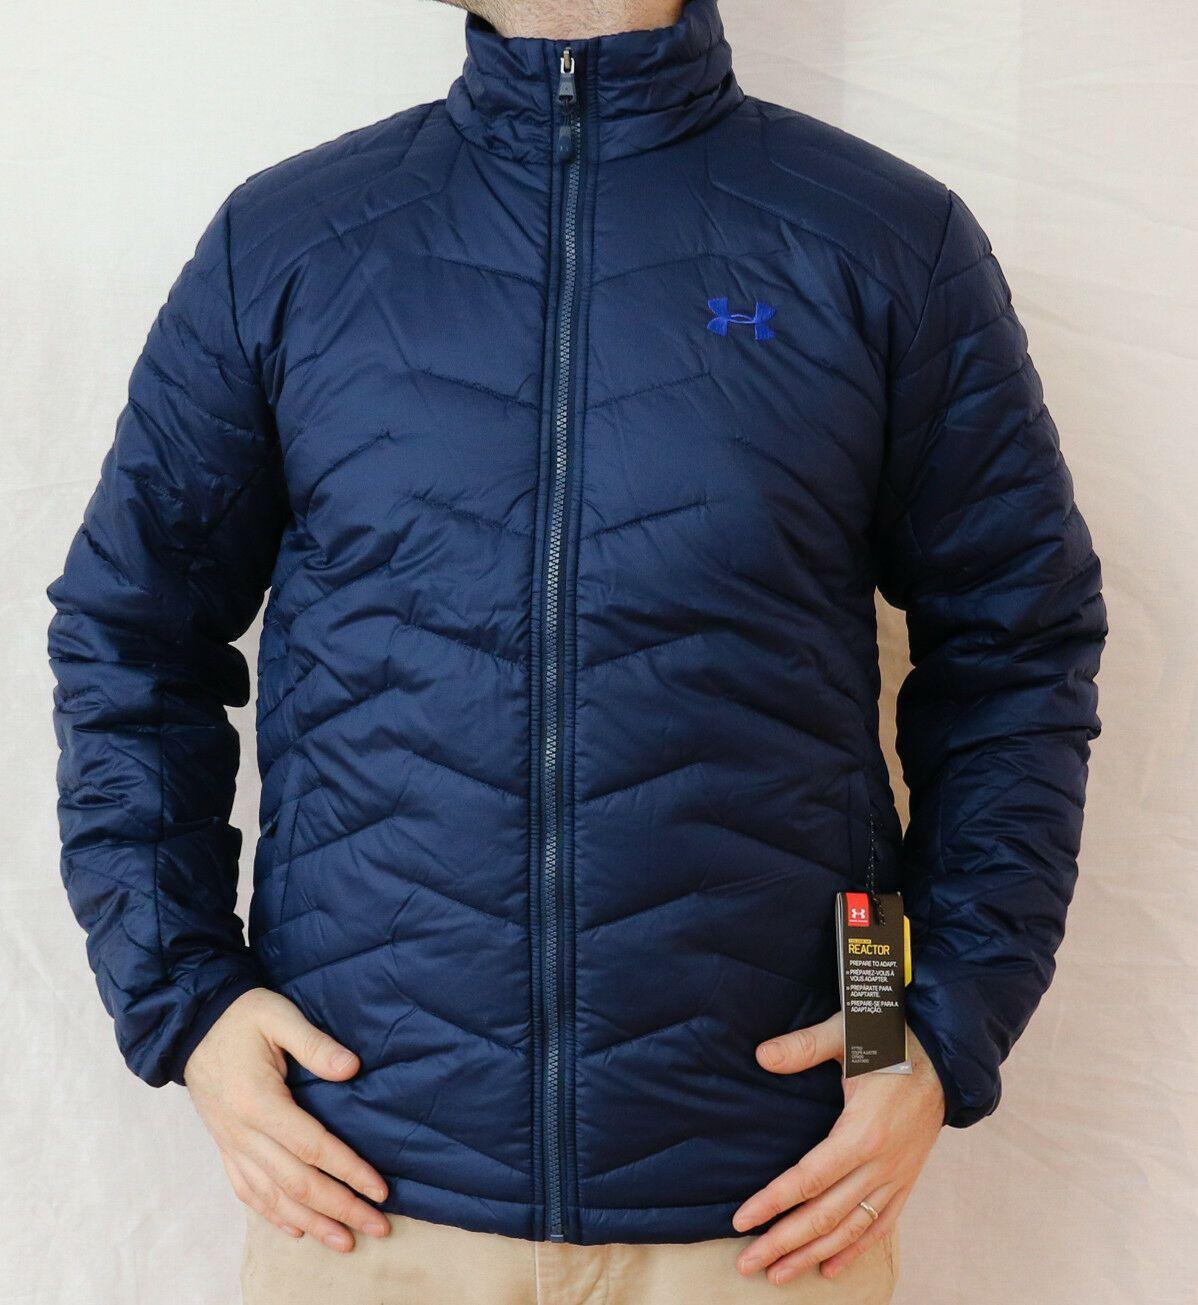 New Under Armour Coldgear Reactor Jacket Men S L 2xl 3xl Blue Ua Puffy Msrp 200 Mens Jackets Jackets Girls Puffer Jacket [ 1305 x 1198 Pixel ]